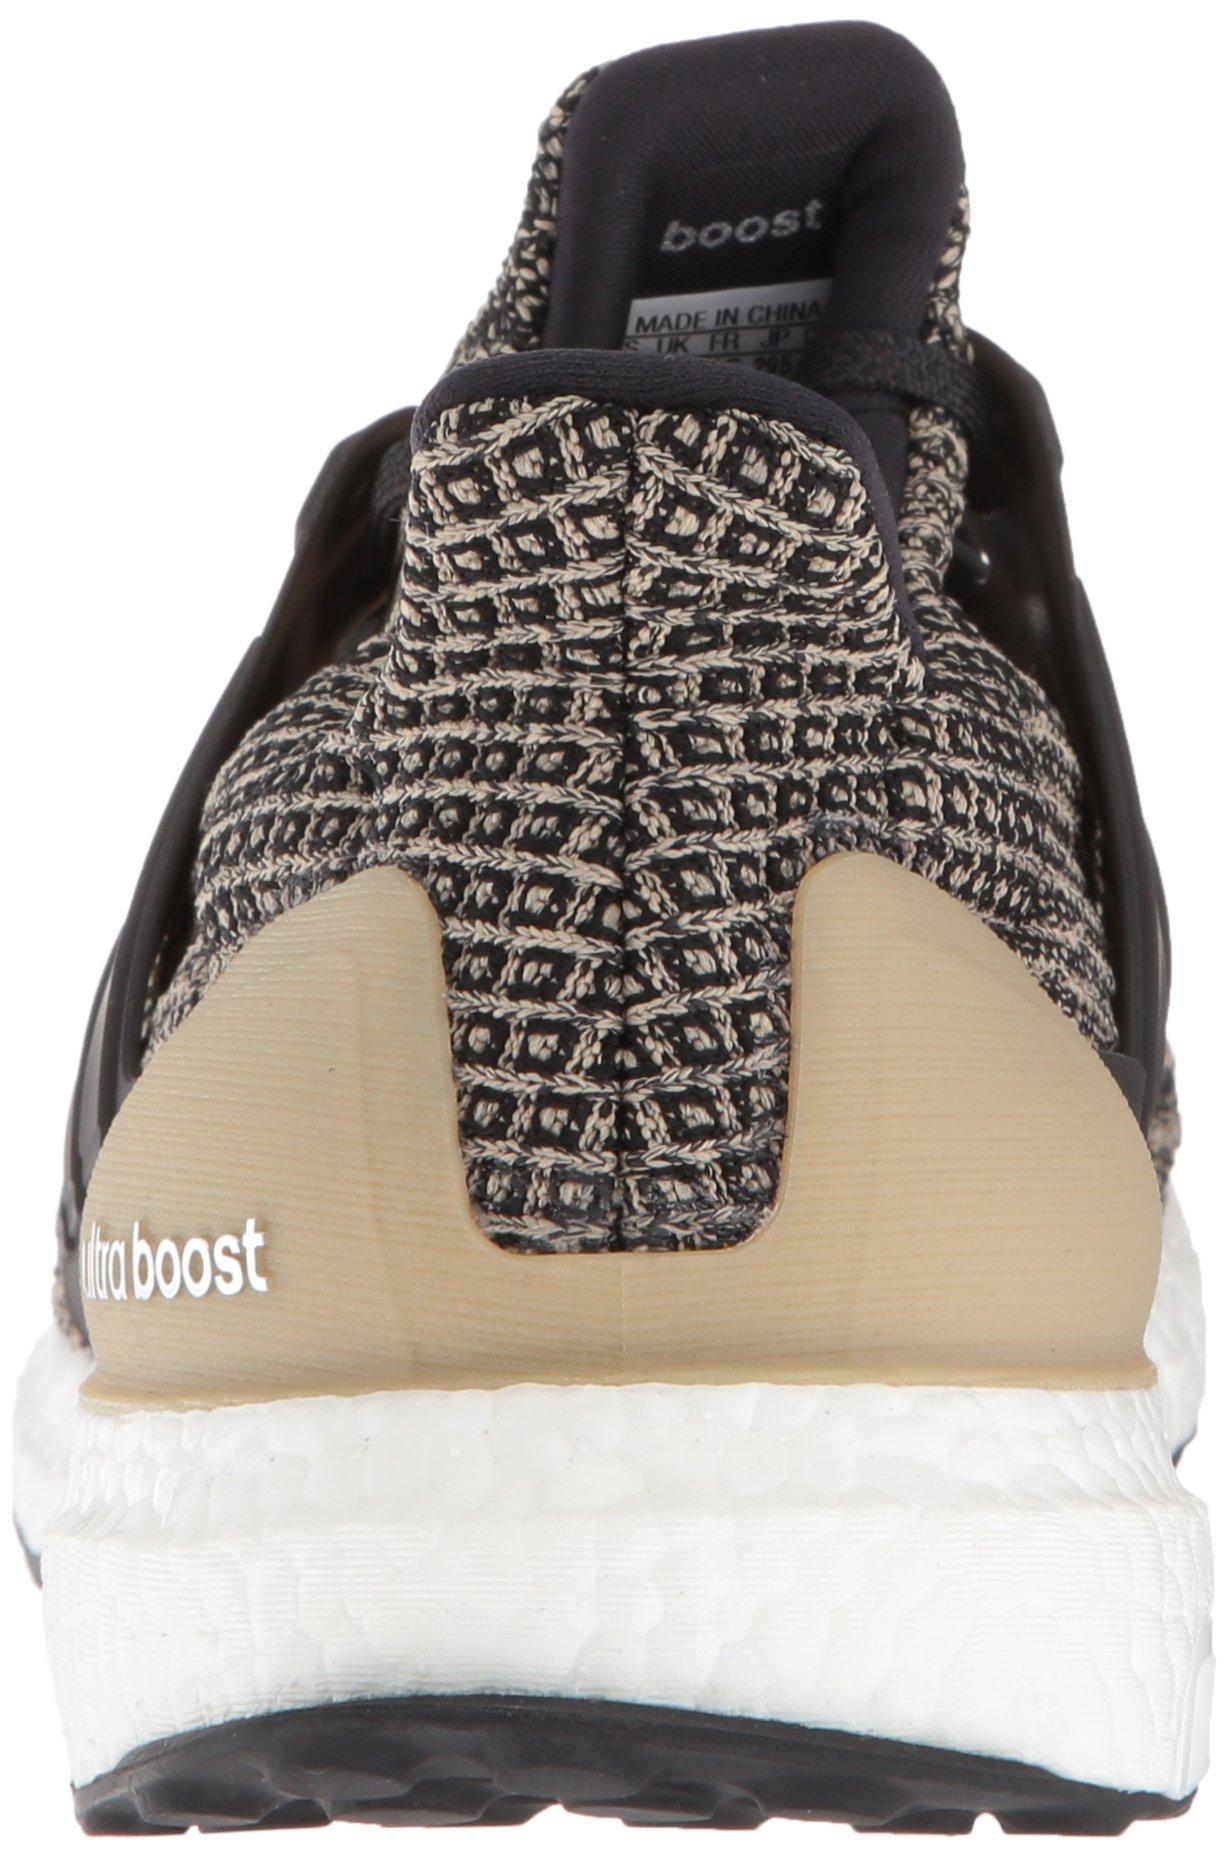 adidas Men's Ultraboost, Black/raw Gold, 6.5 M US by adidas (Image #2)